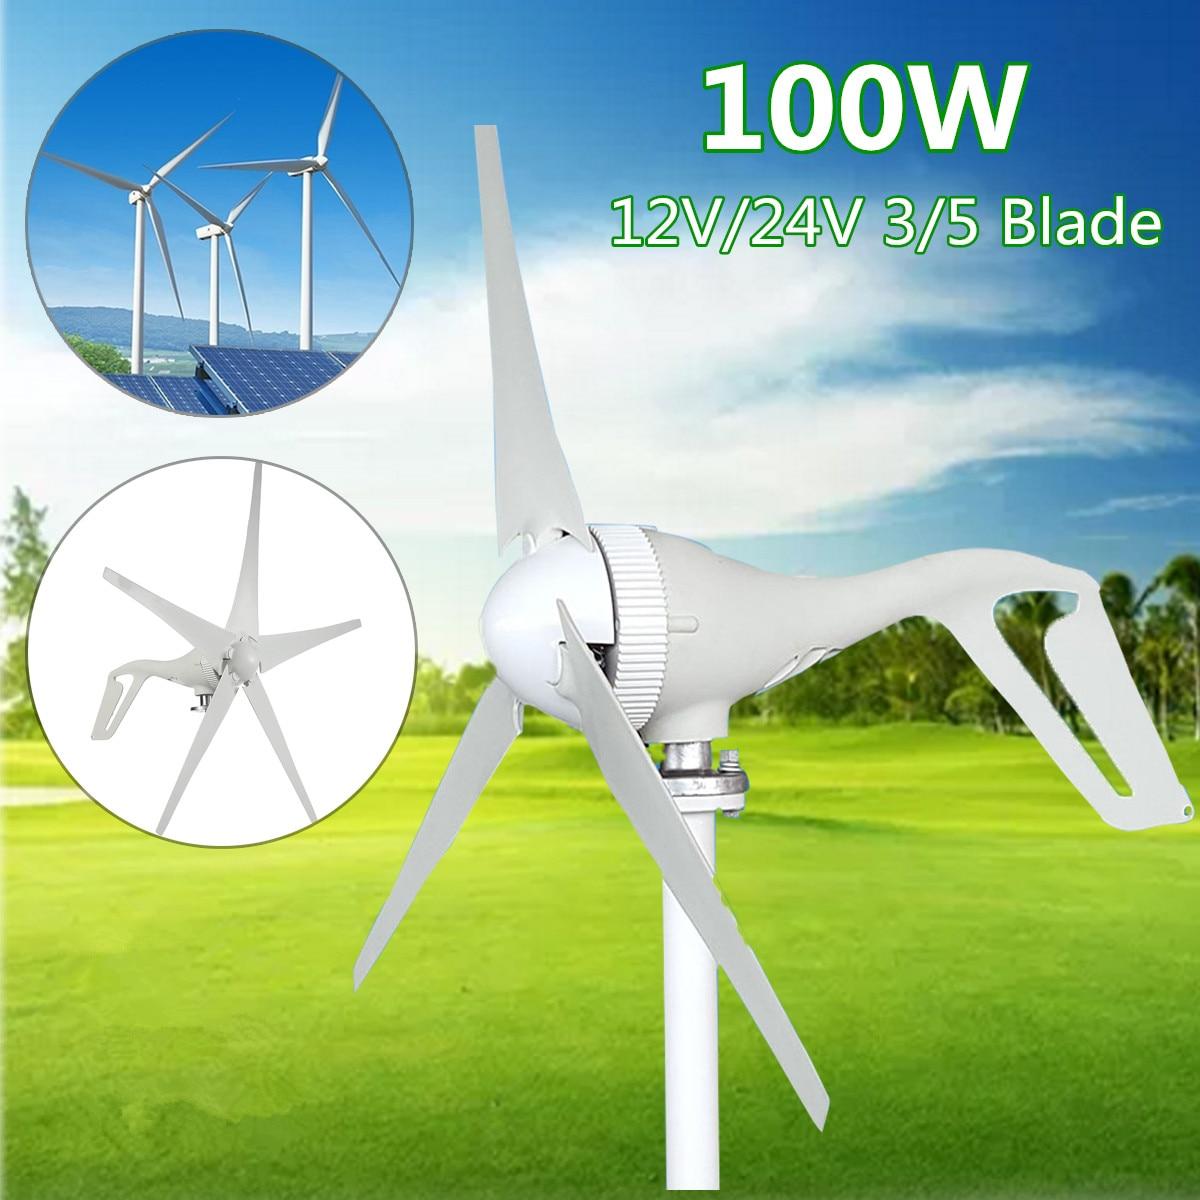 100W 12/24V 3/5 Blades Small Wind Turbine Generator Lantern Motor Kit Vertical Axis Wind Generator Kits